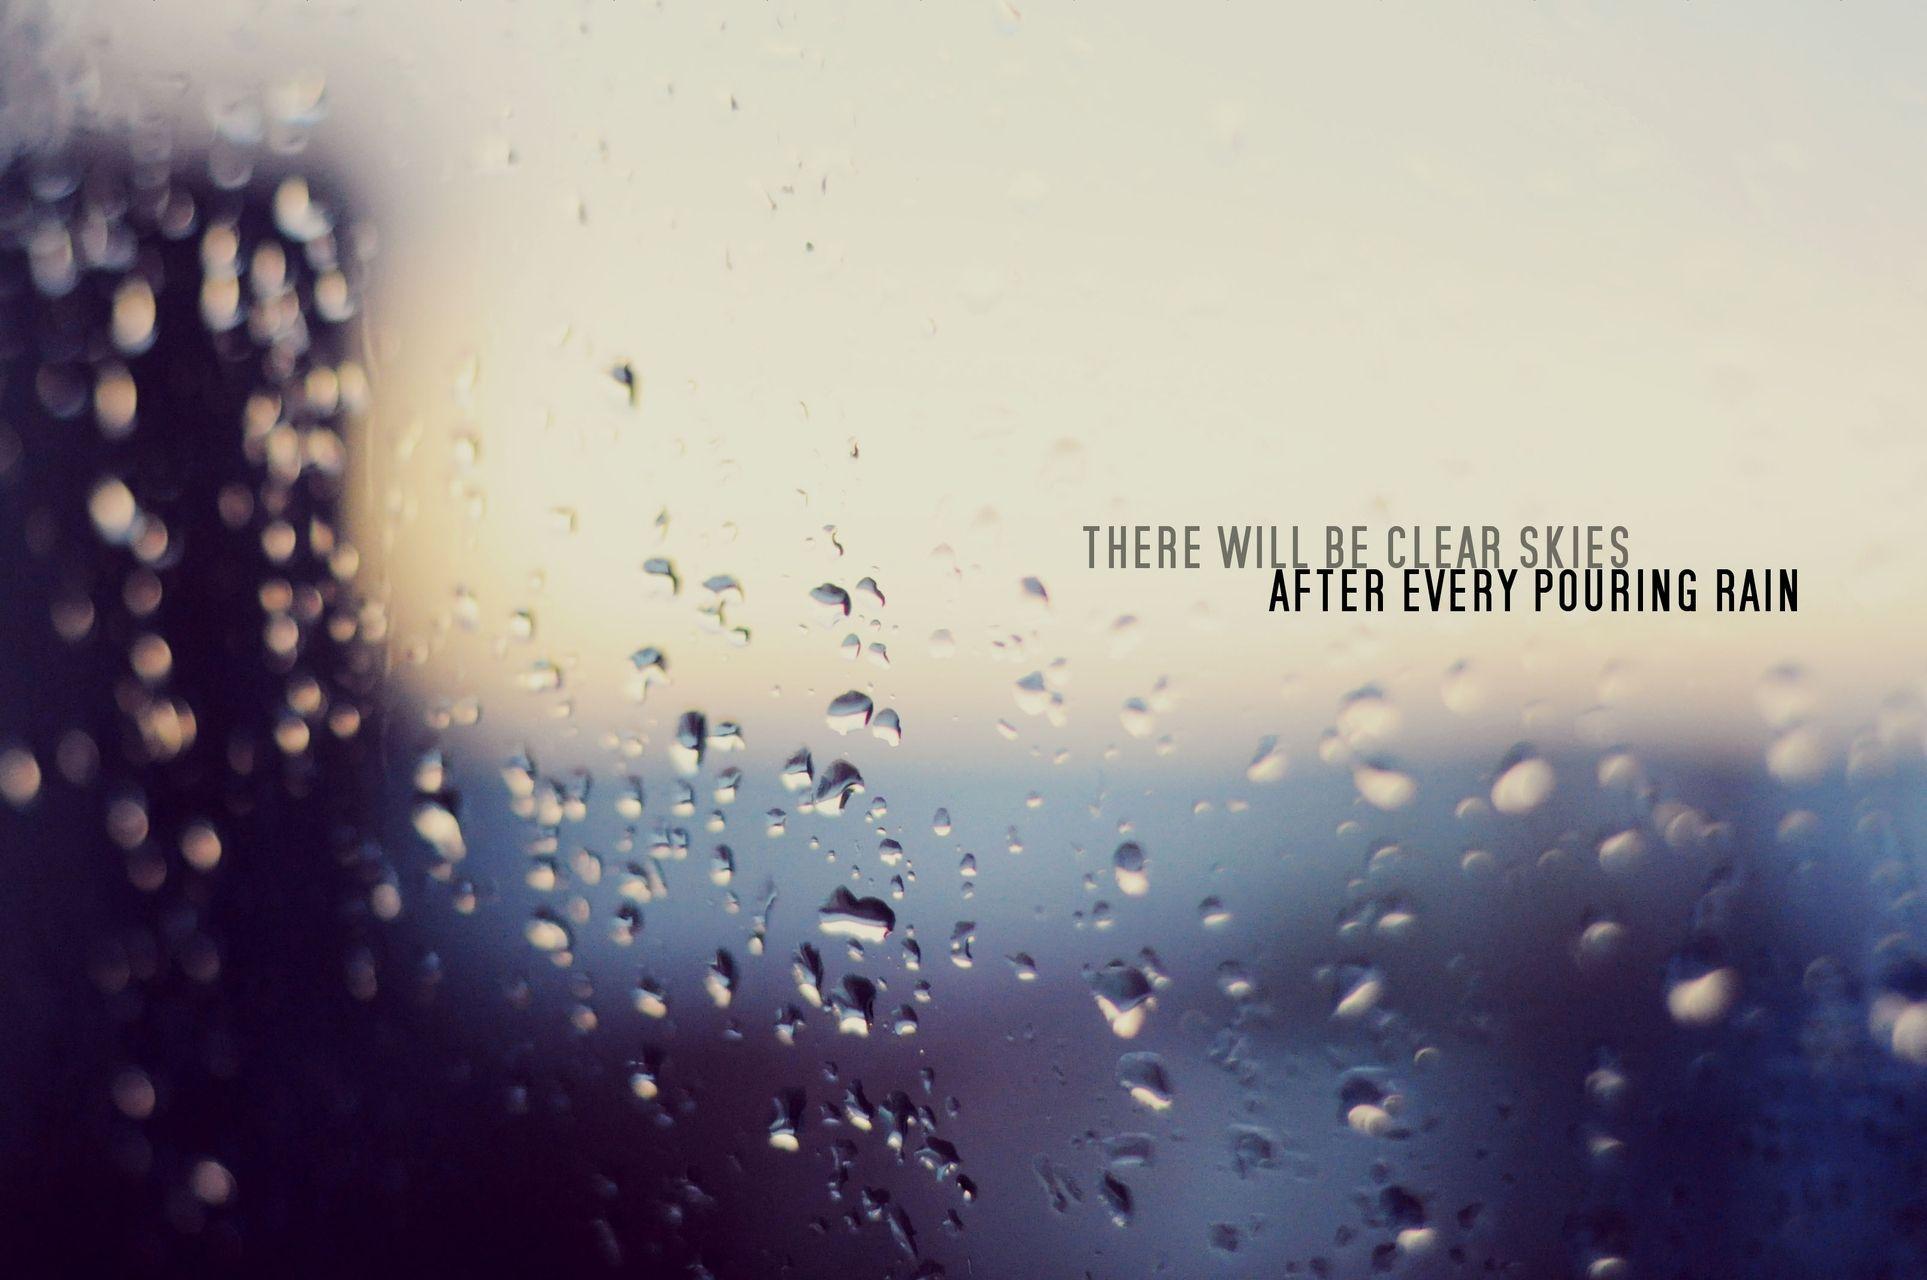 Say It Believe It Keep The Faith 9 365 Ogq Backgrounds Hd Rain Quotes Rain Cover Photo Rain Cover Photo Facebook